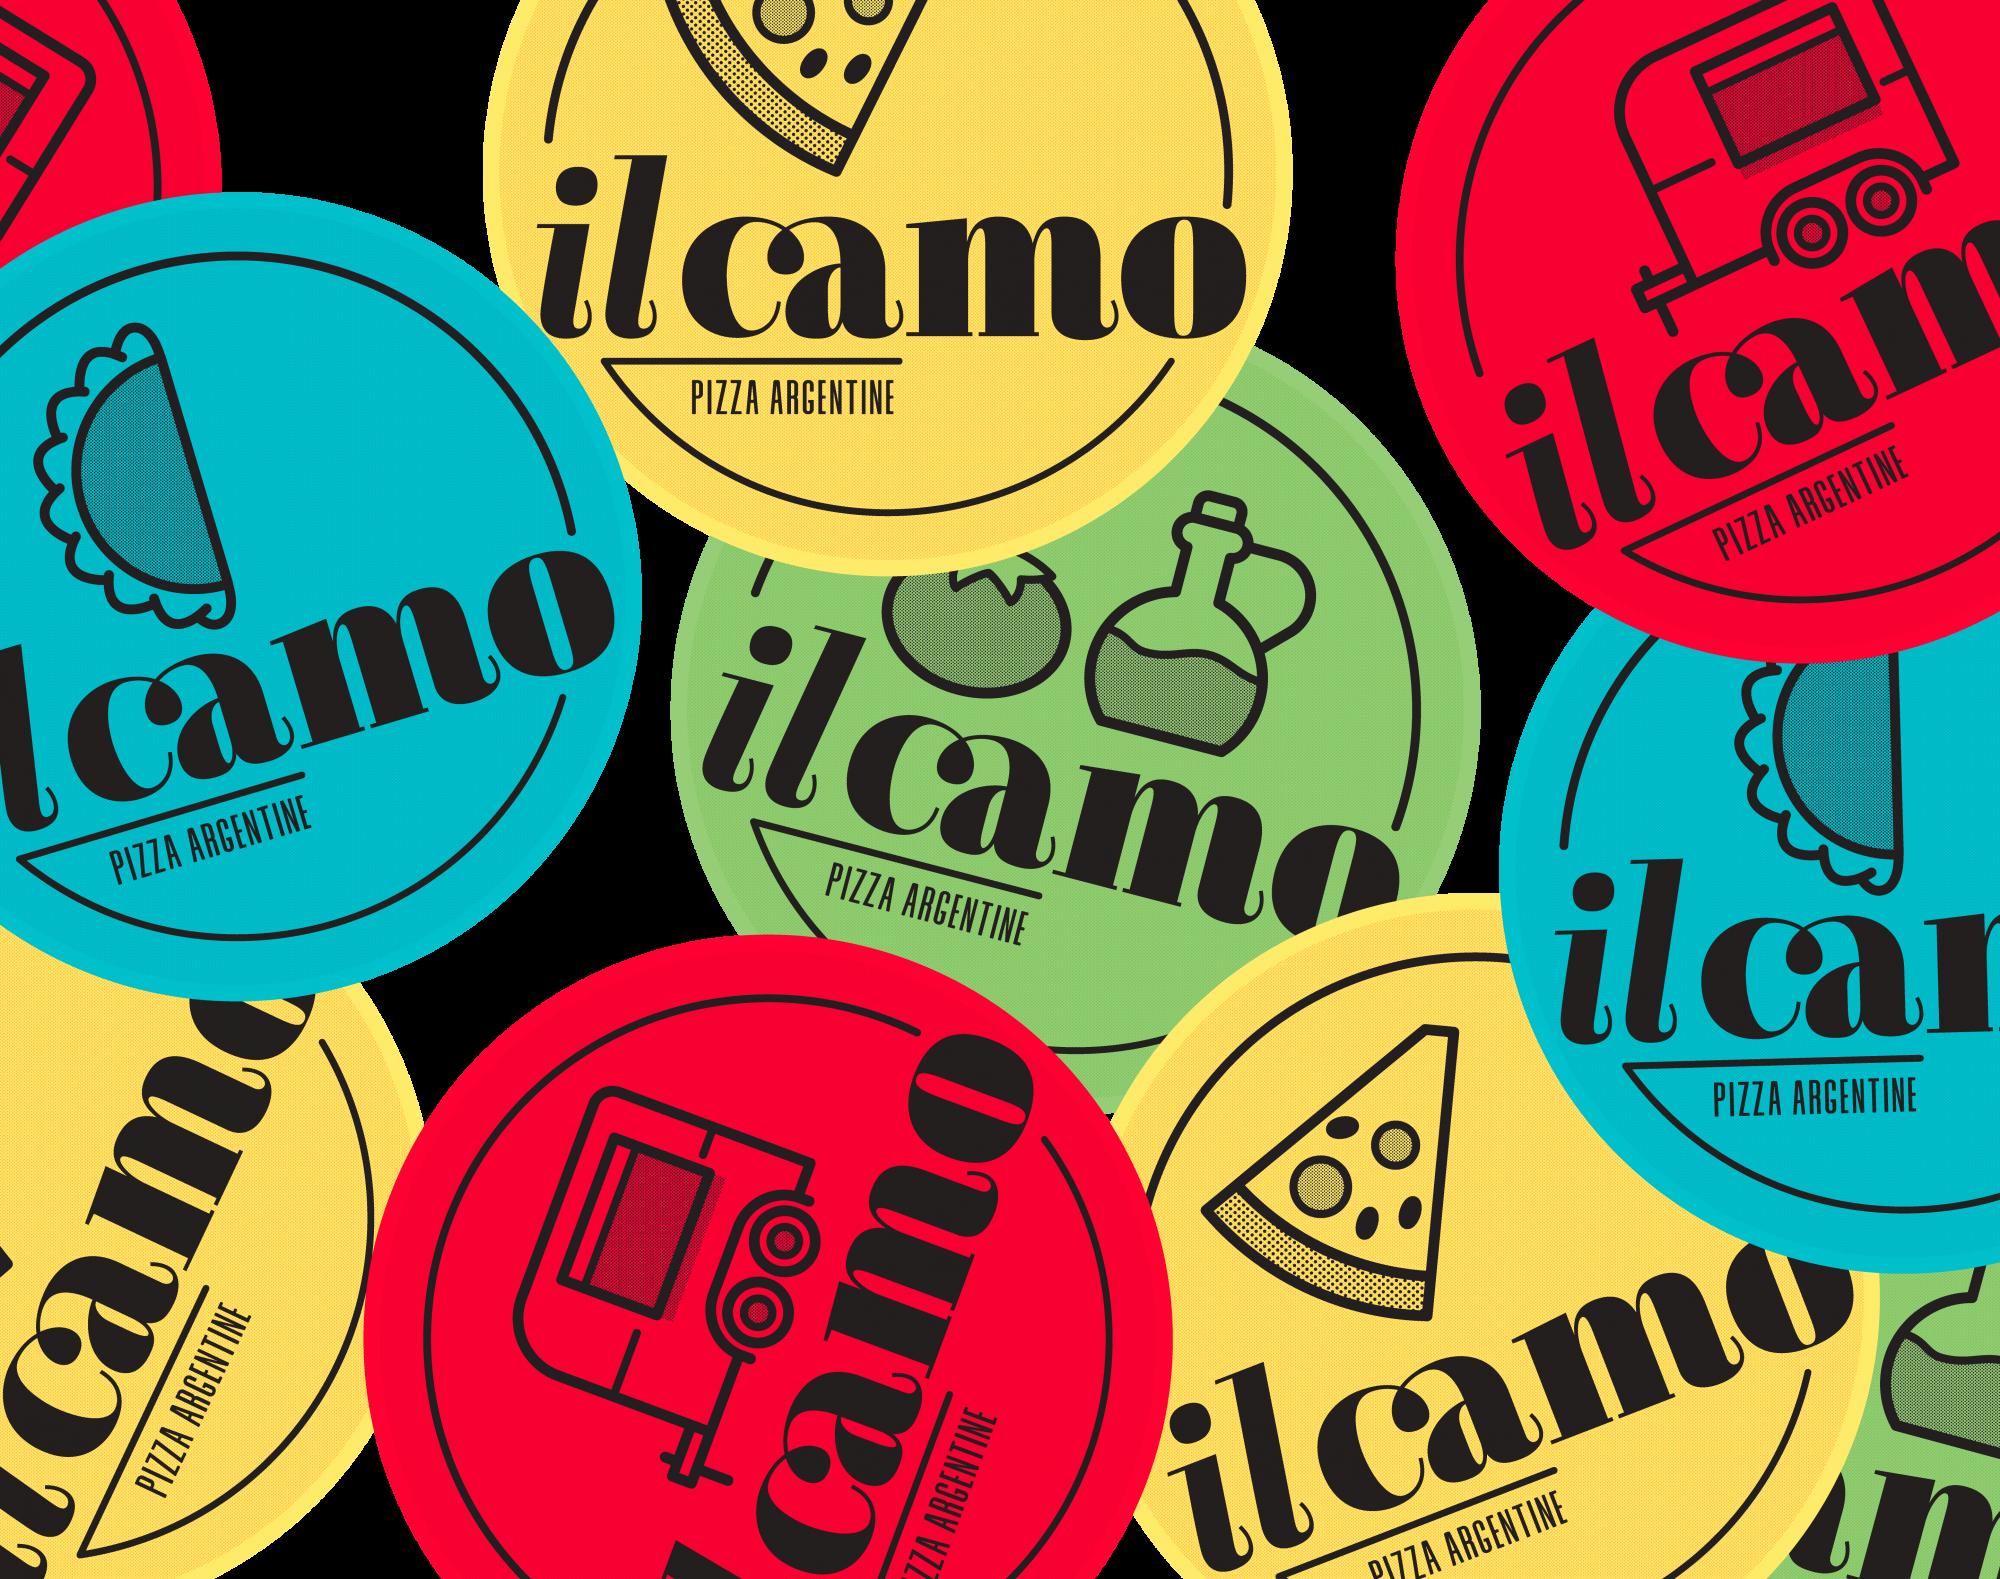 ilcamo9